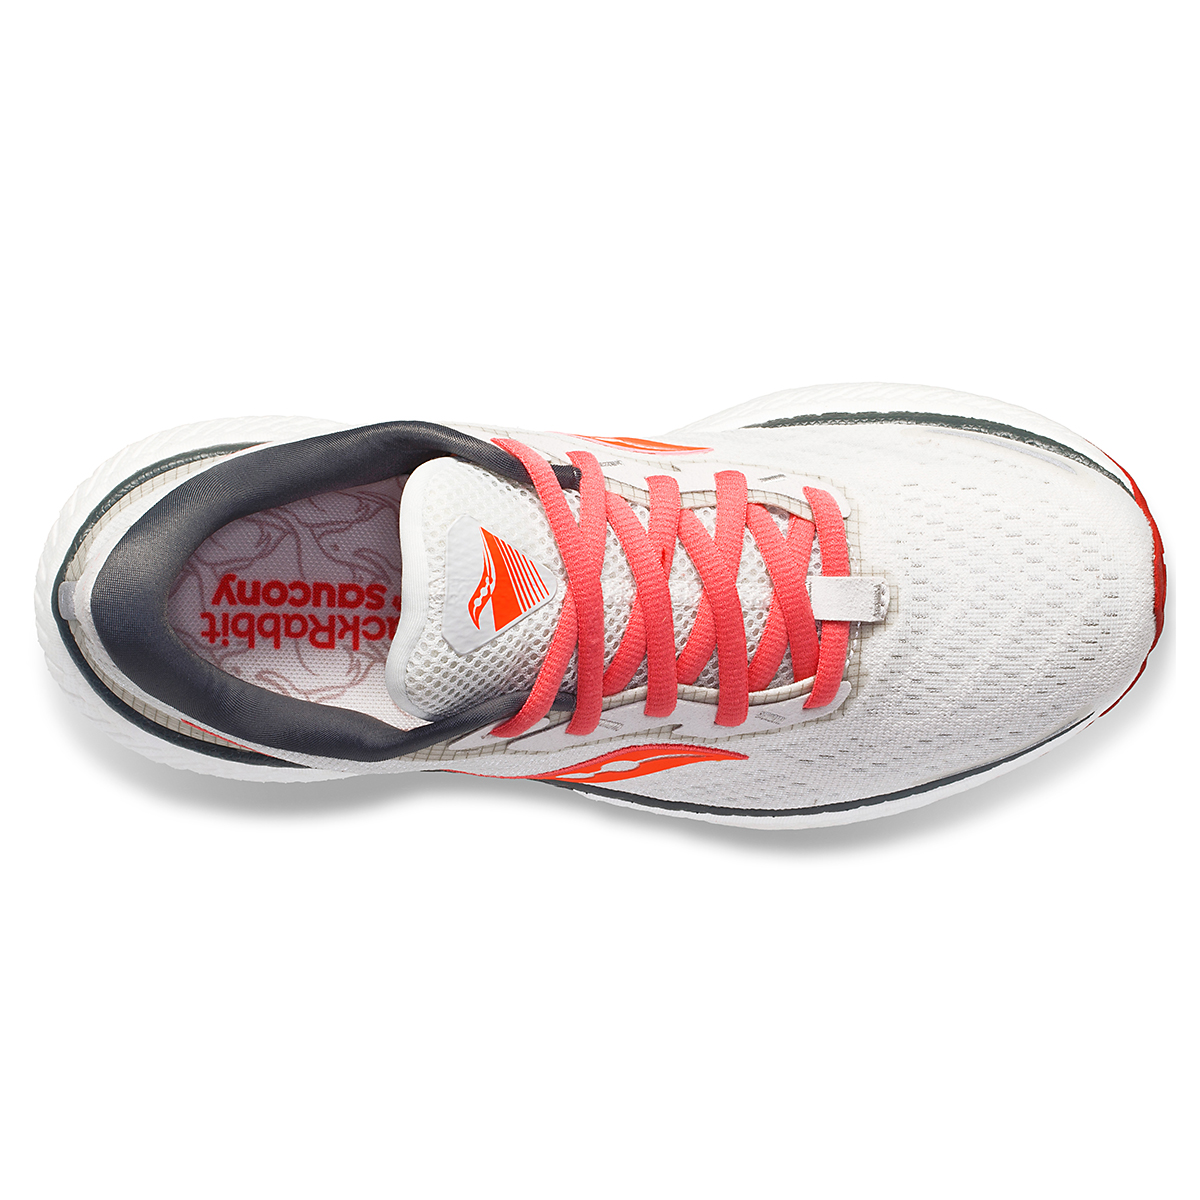 Women's Saucony Triumph 19 Running Shoe - Color: Jackalope - Size: 5 - Width: Regular, Jackalope, large, image 3